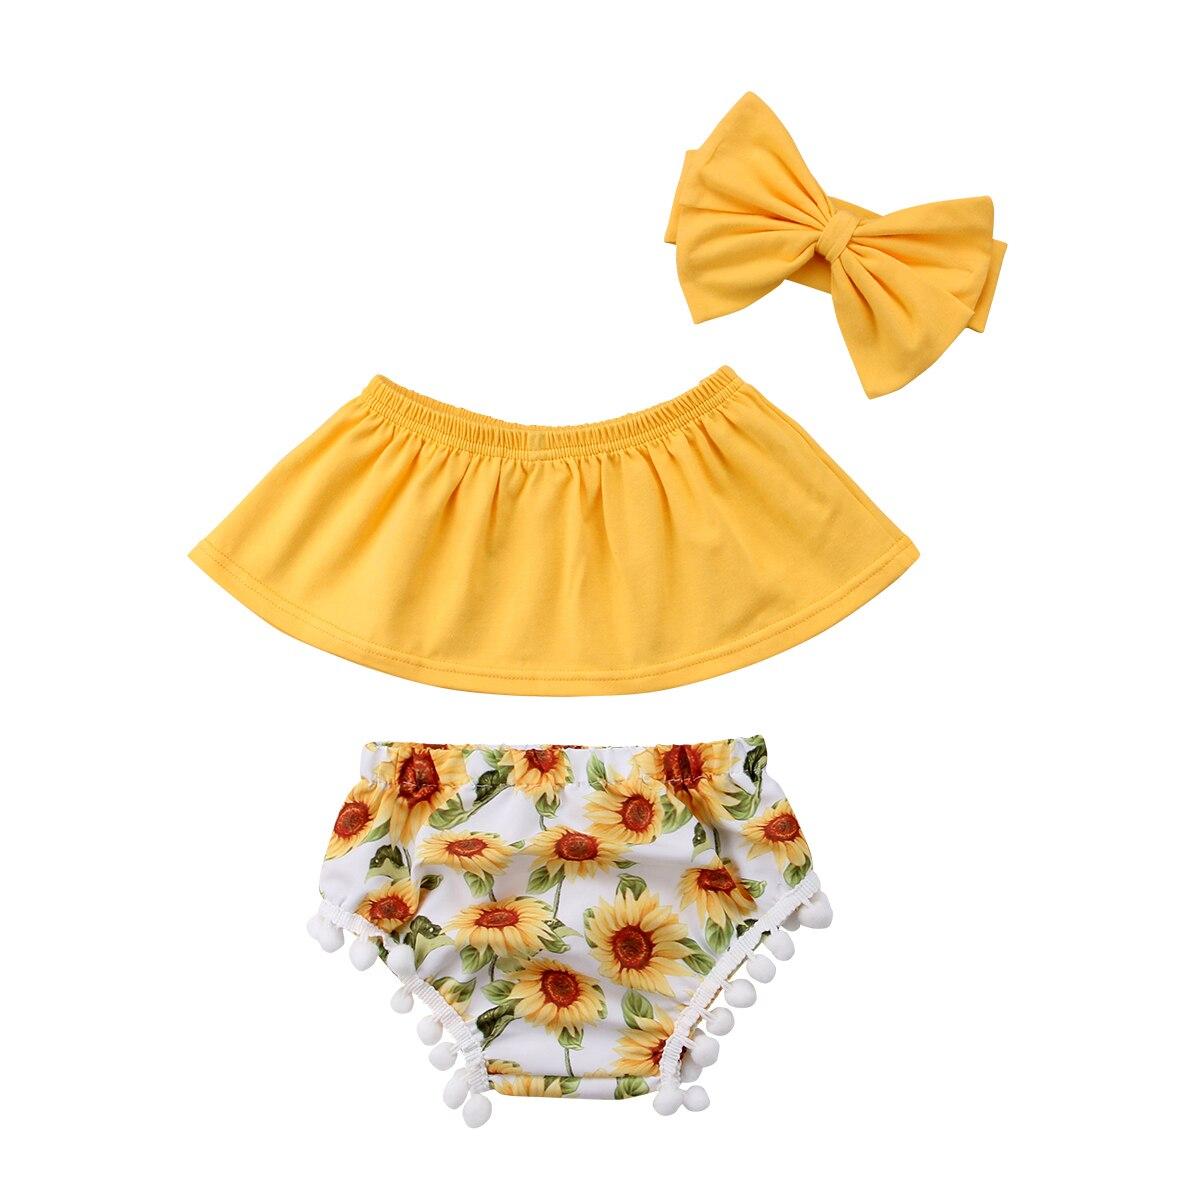 16925868528 Summer Toddler Baby Girls Outfit Off Shoulder Tops+ Sunflower Tassel Floral  Short +Headband 2018